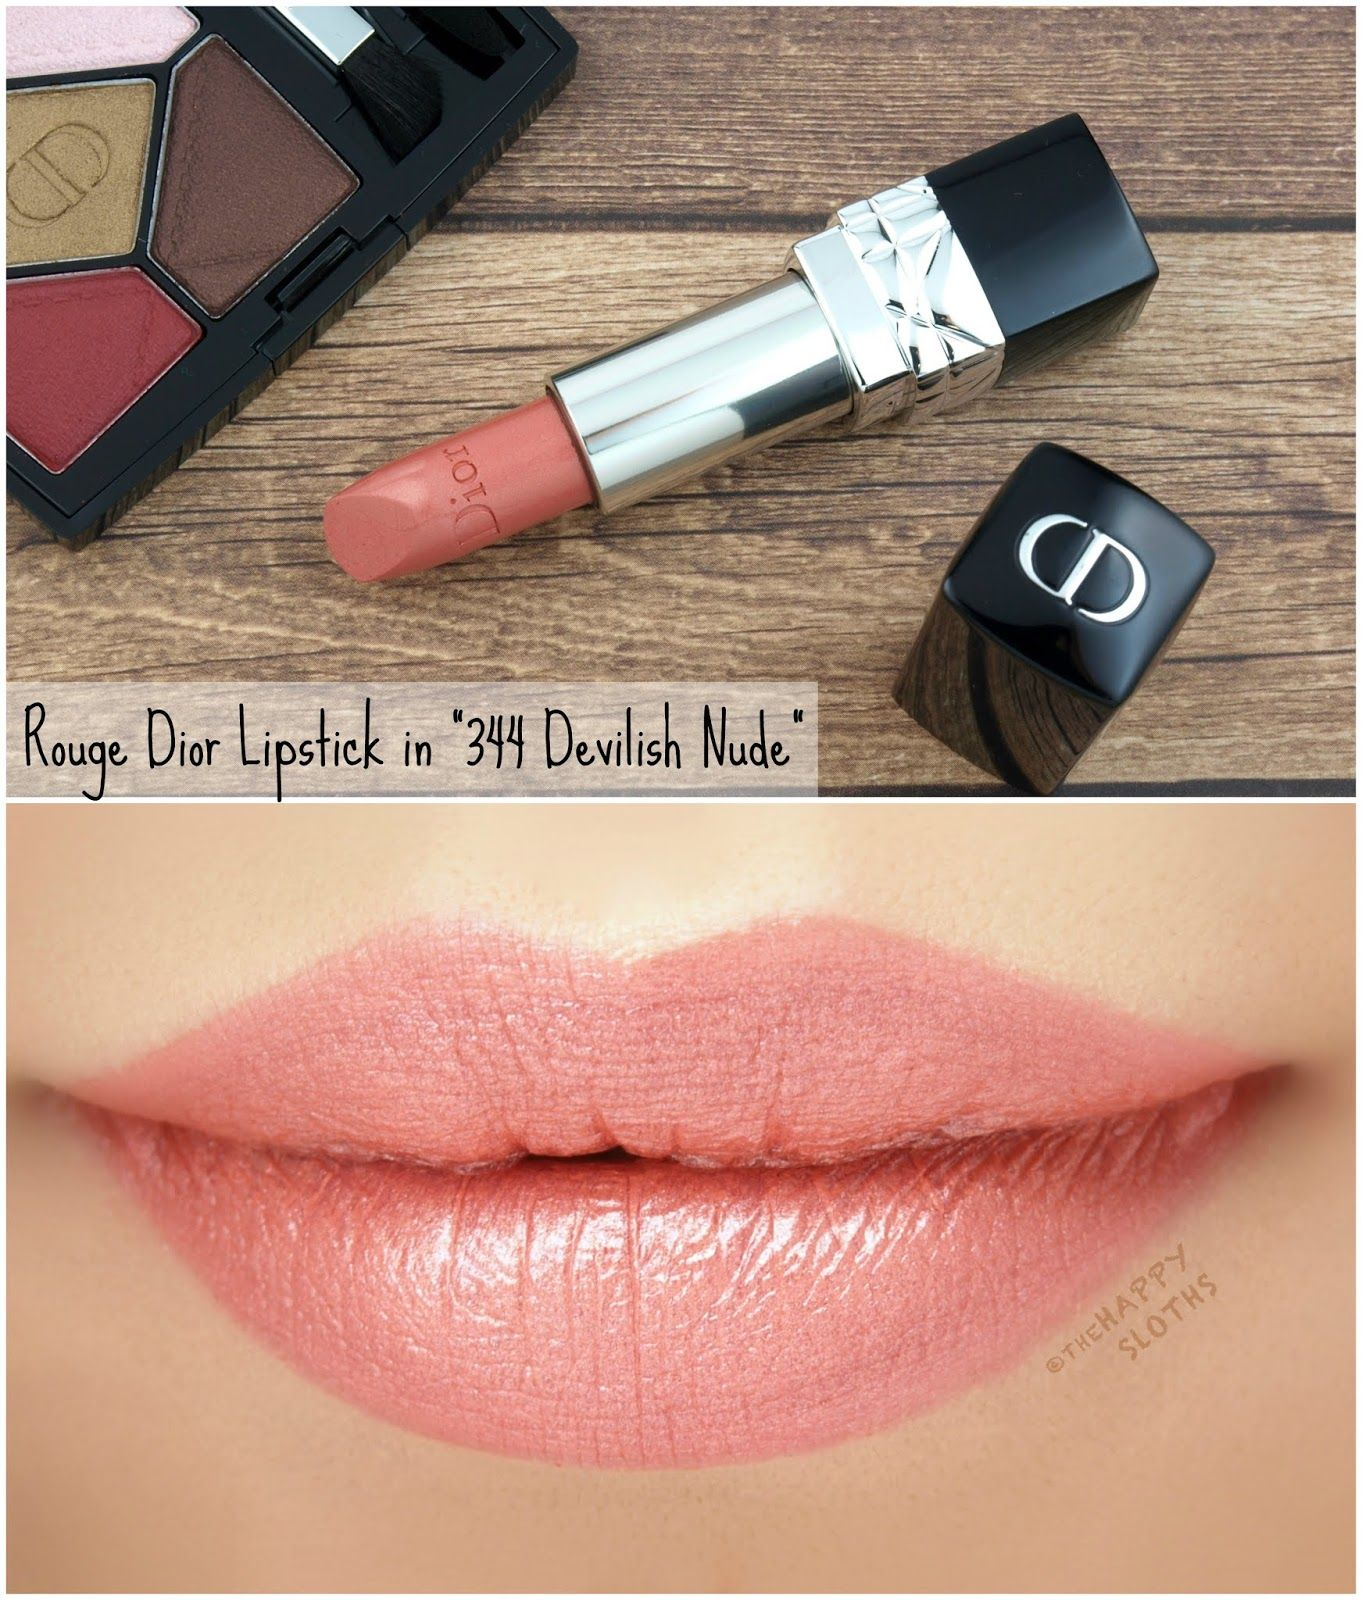 Pixy Silky Fit Lipstick 106 Strawberry Milk Daftar Harga Termurah Amalia Satin Dan Aneka Dior Fall 2018 En Diable Collection Rouge Couture Colour In 344